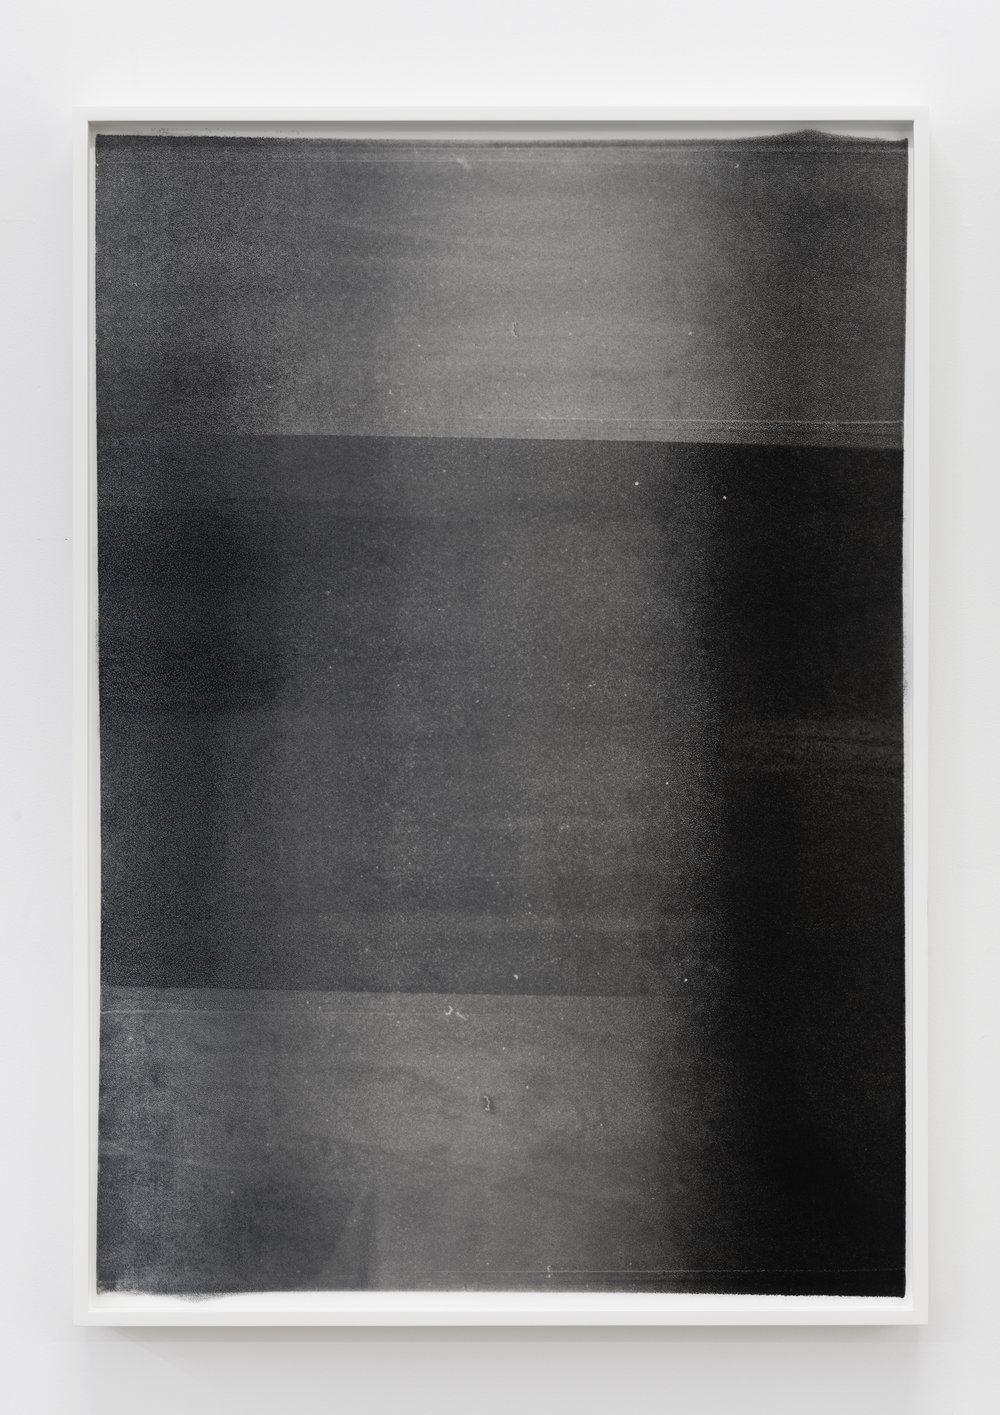 Untitled (dark glow) , Oil on Mylar, 2016, 31 x 22 inches